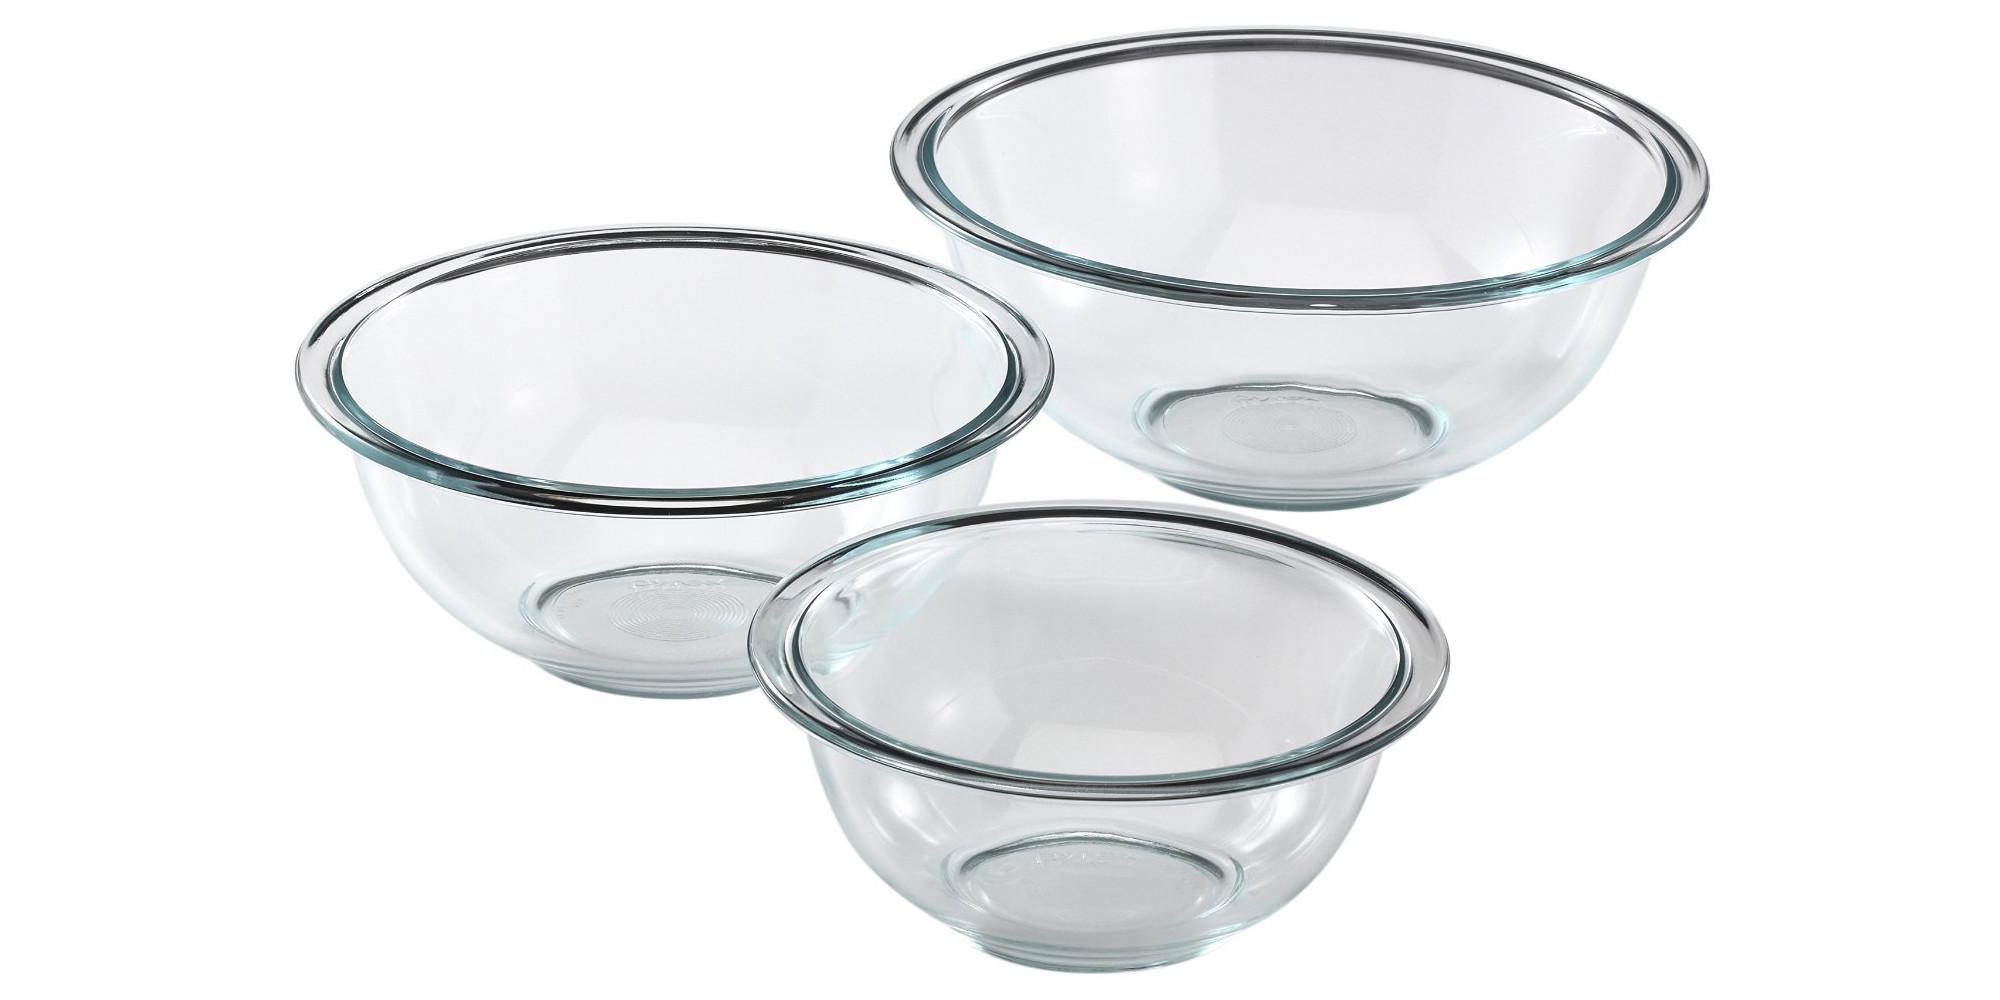 pyrex-prepware-3-piece-glass-mixing-bowl-set-4